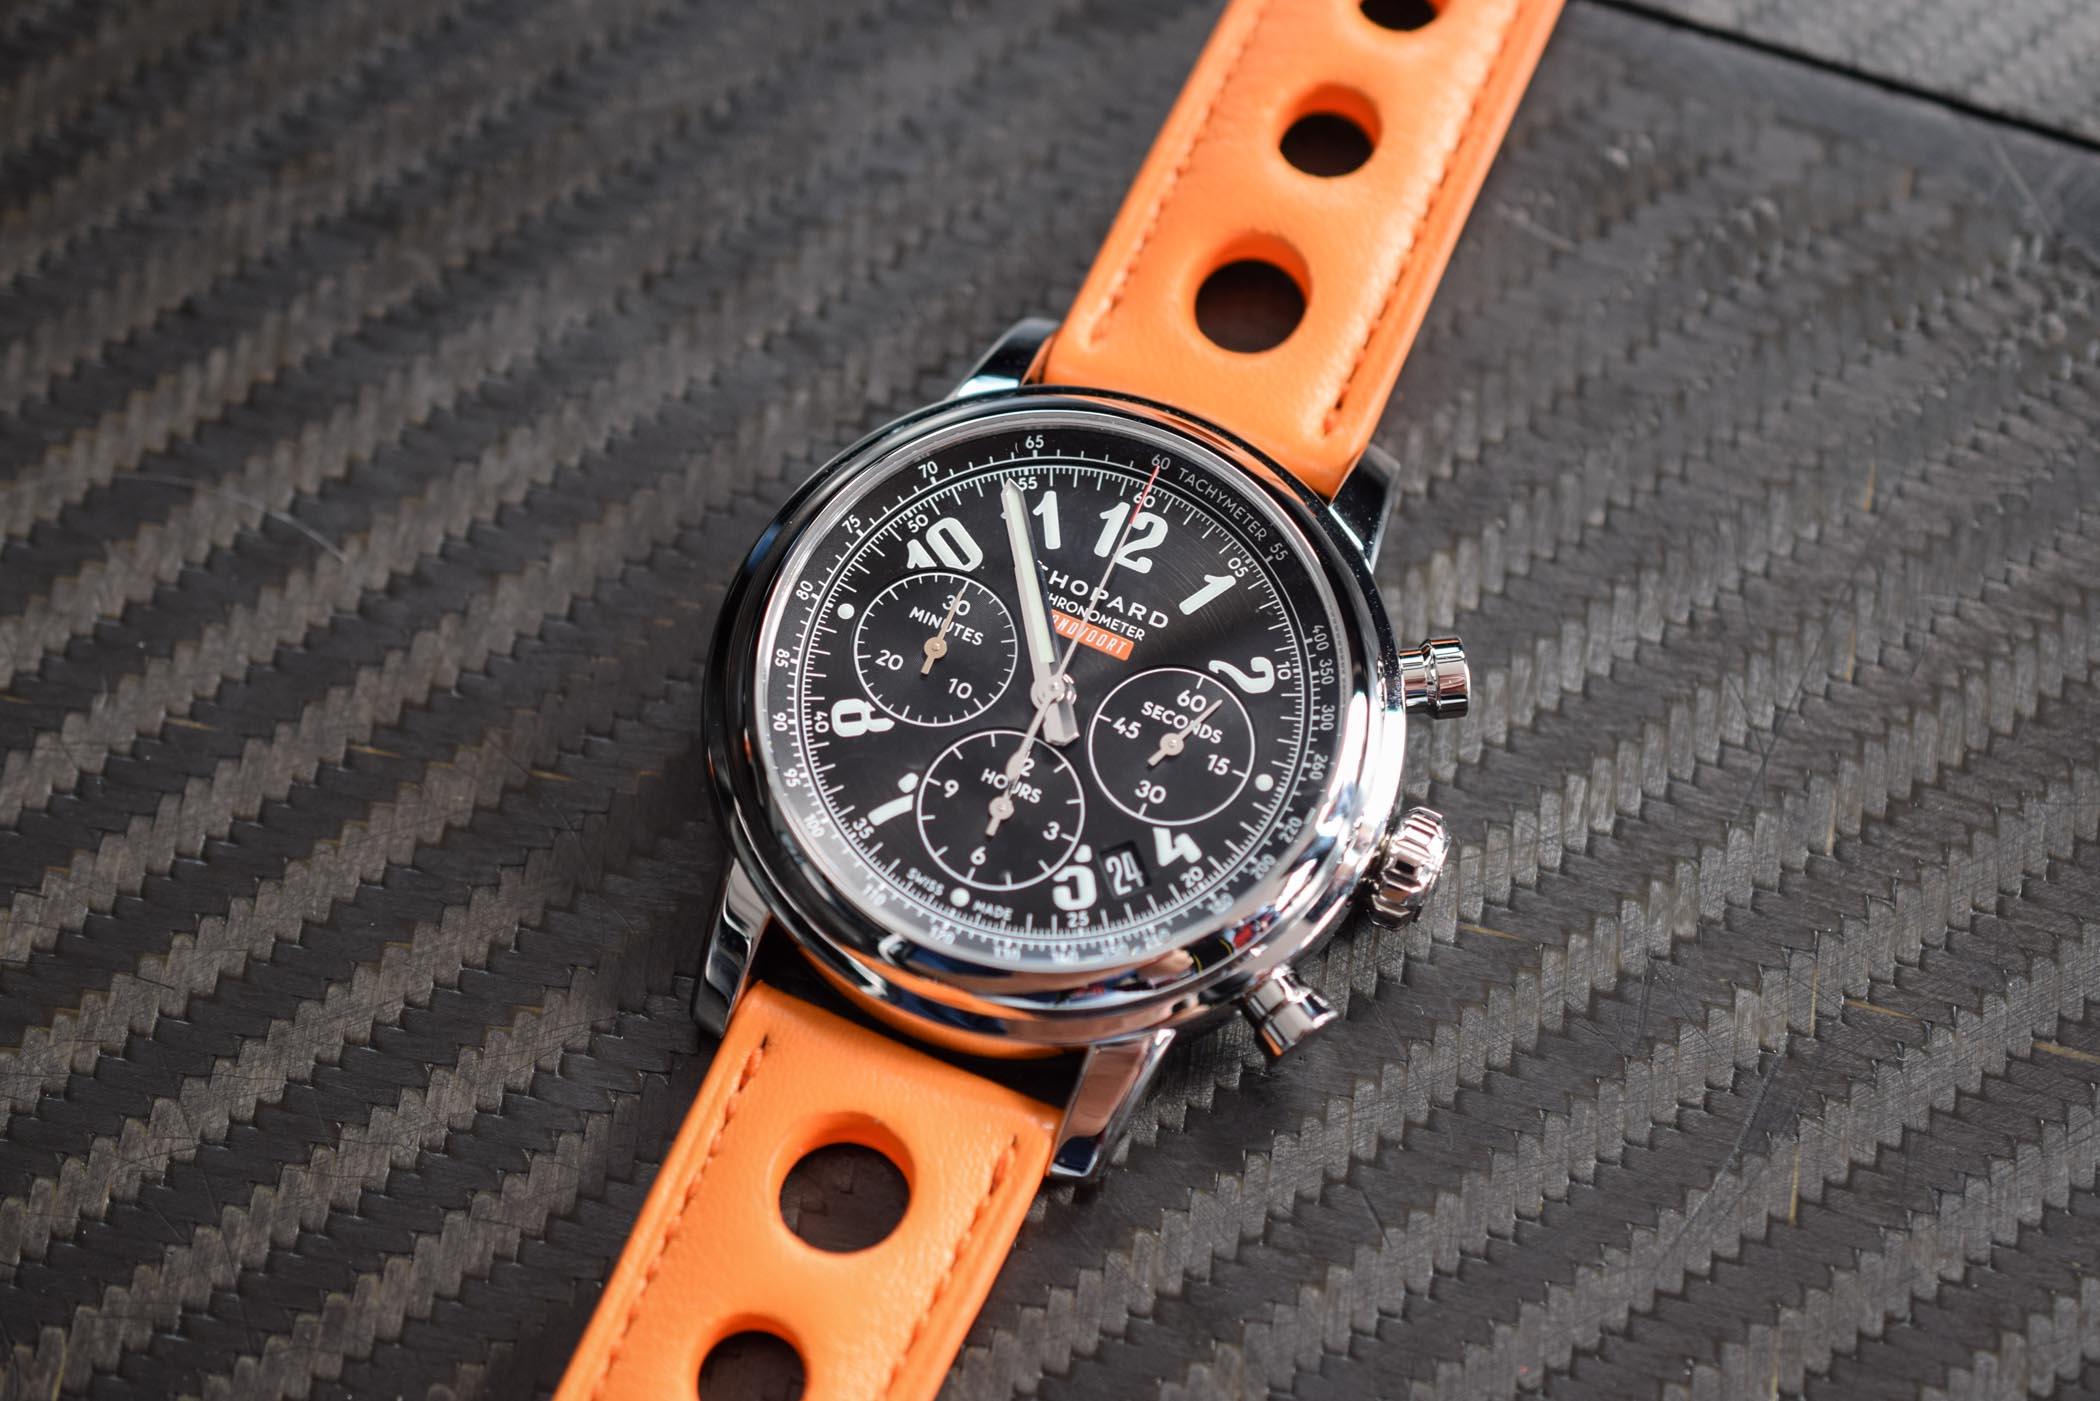 Chopard Mille Miglia Chronograph Zandvoort Historic Grand Prix - 4